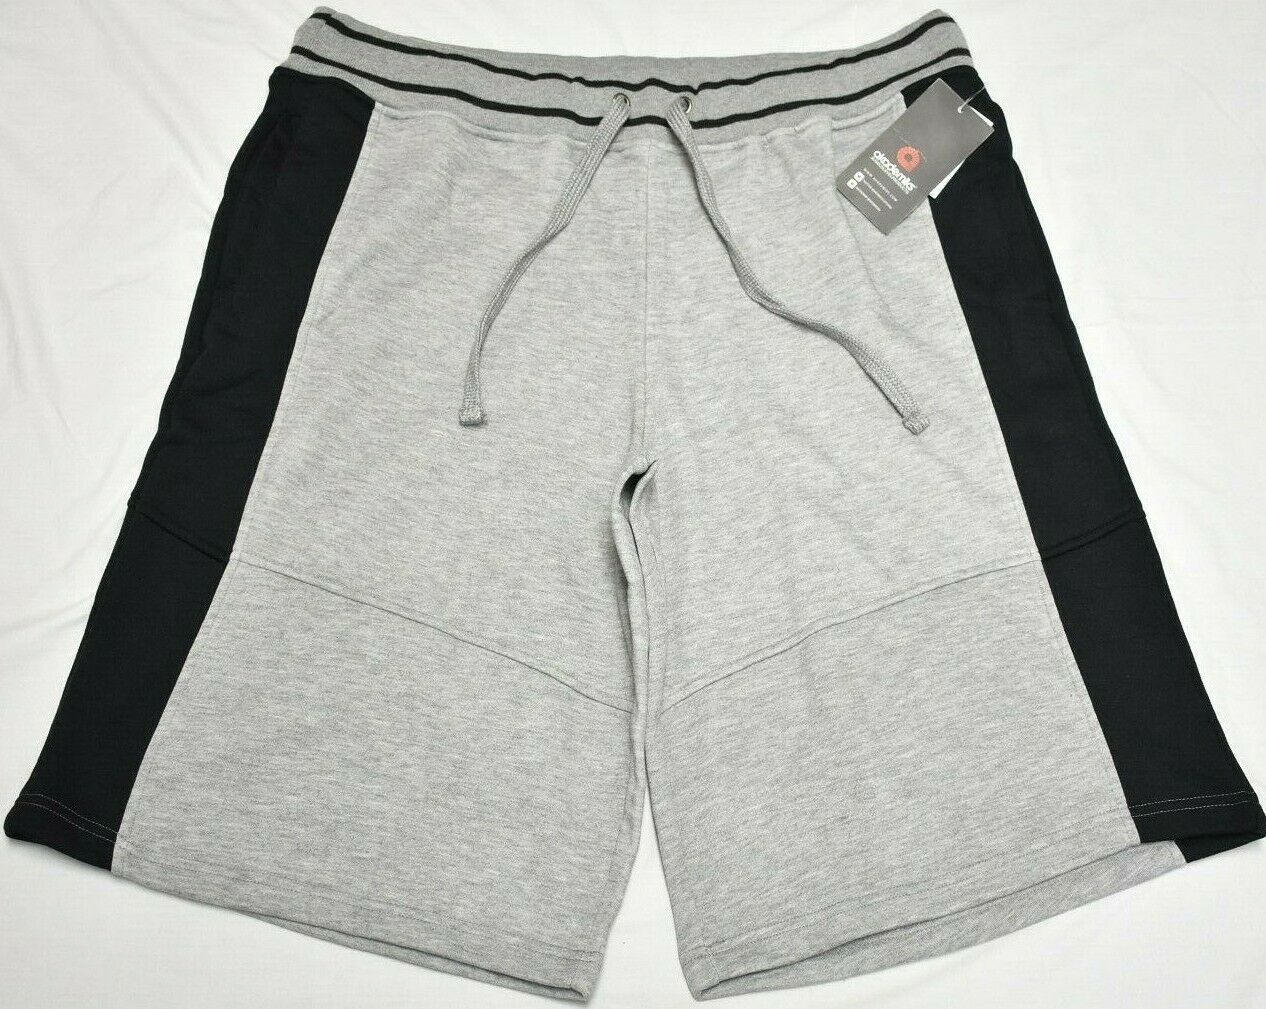 Akademiks Sweat Shorts Men's 5XL 5XB 5X Colorblock Panel Fleece Grey Urban Q960